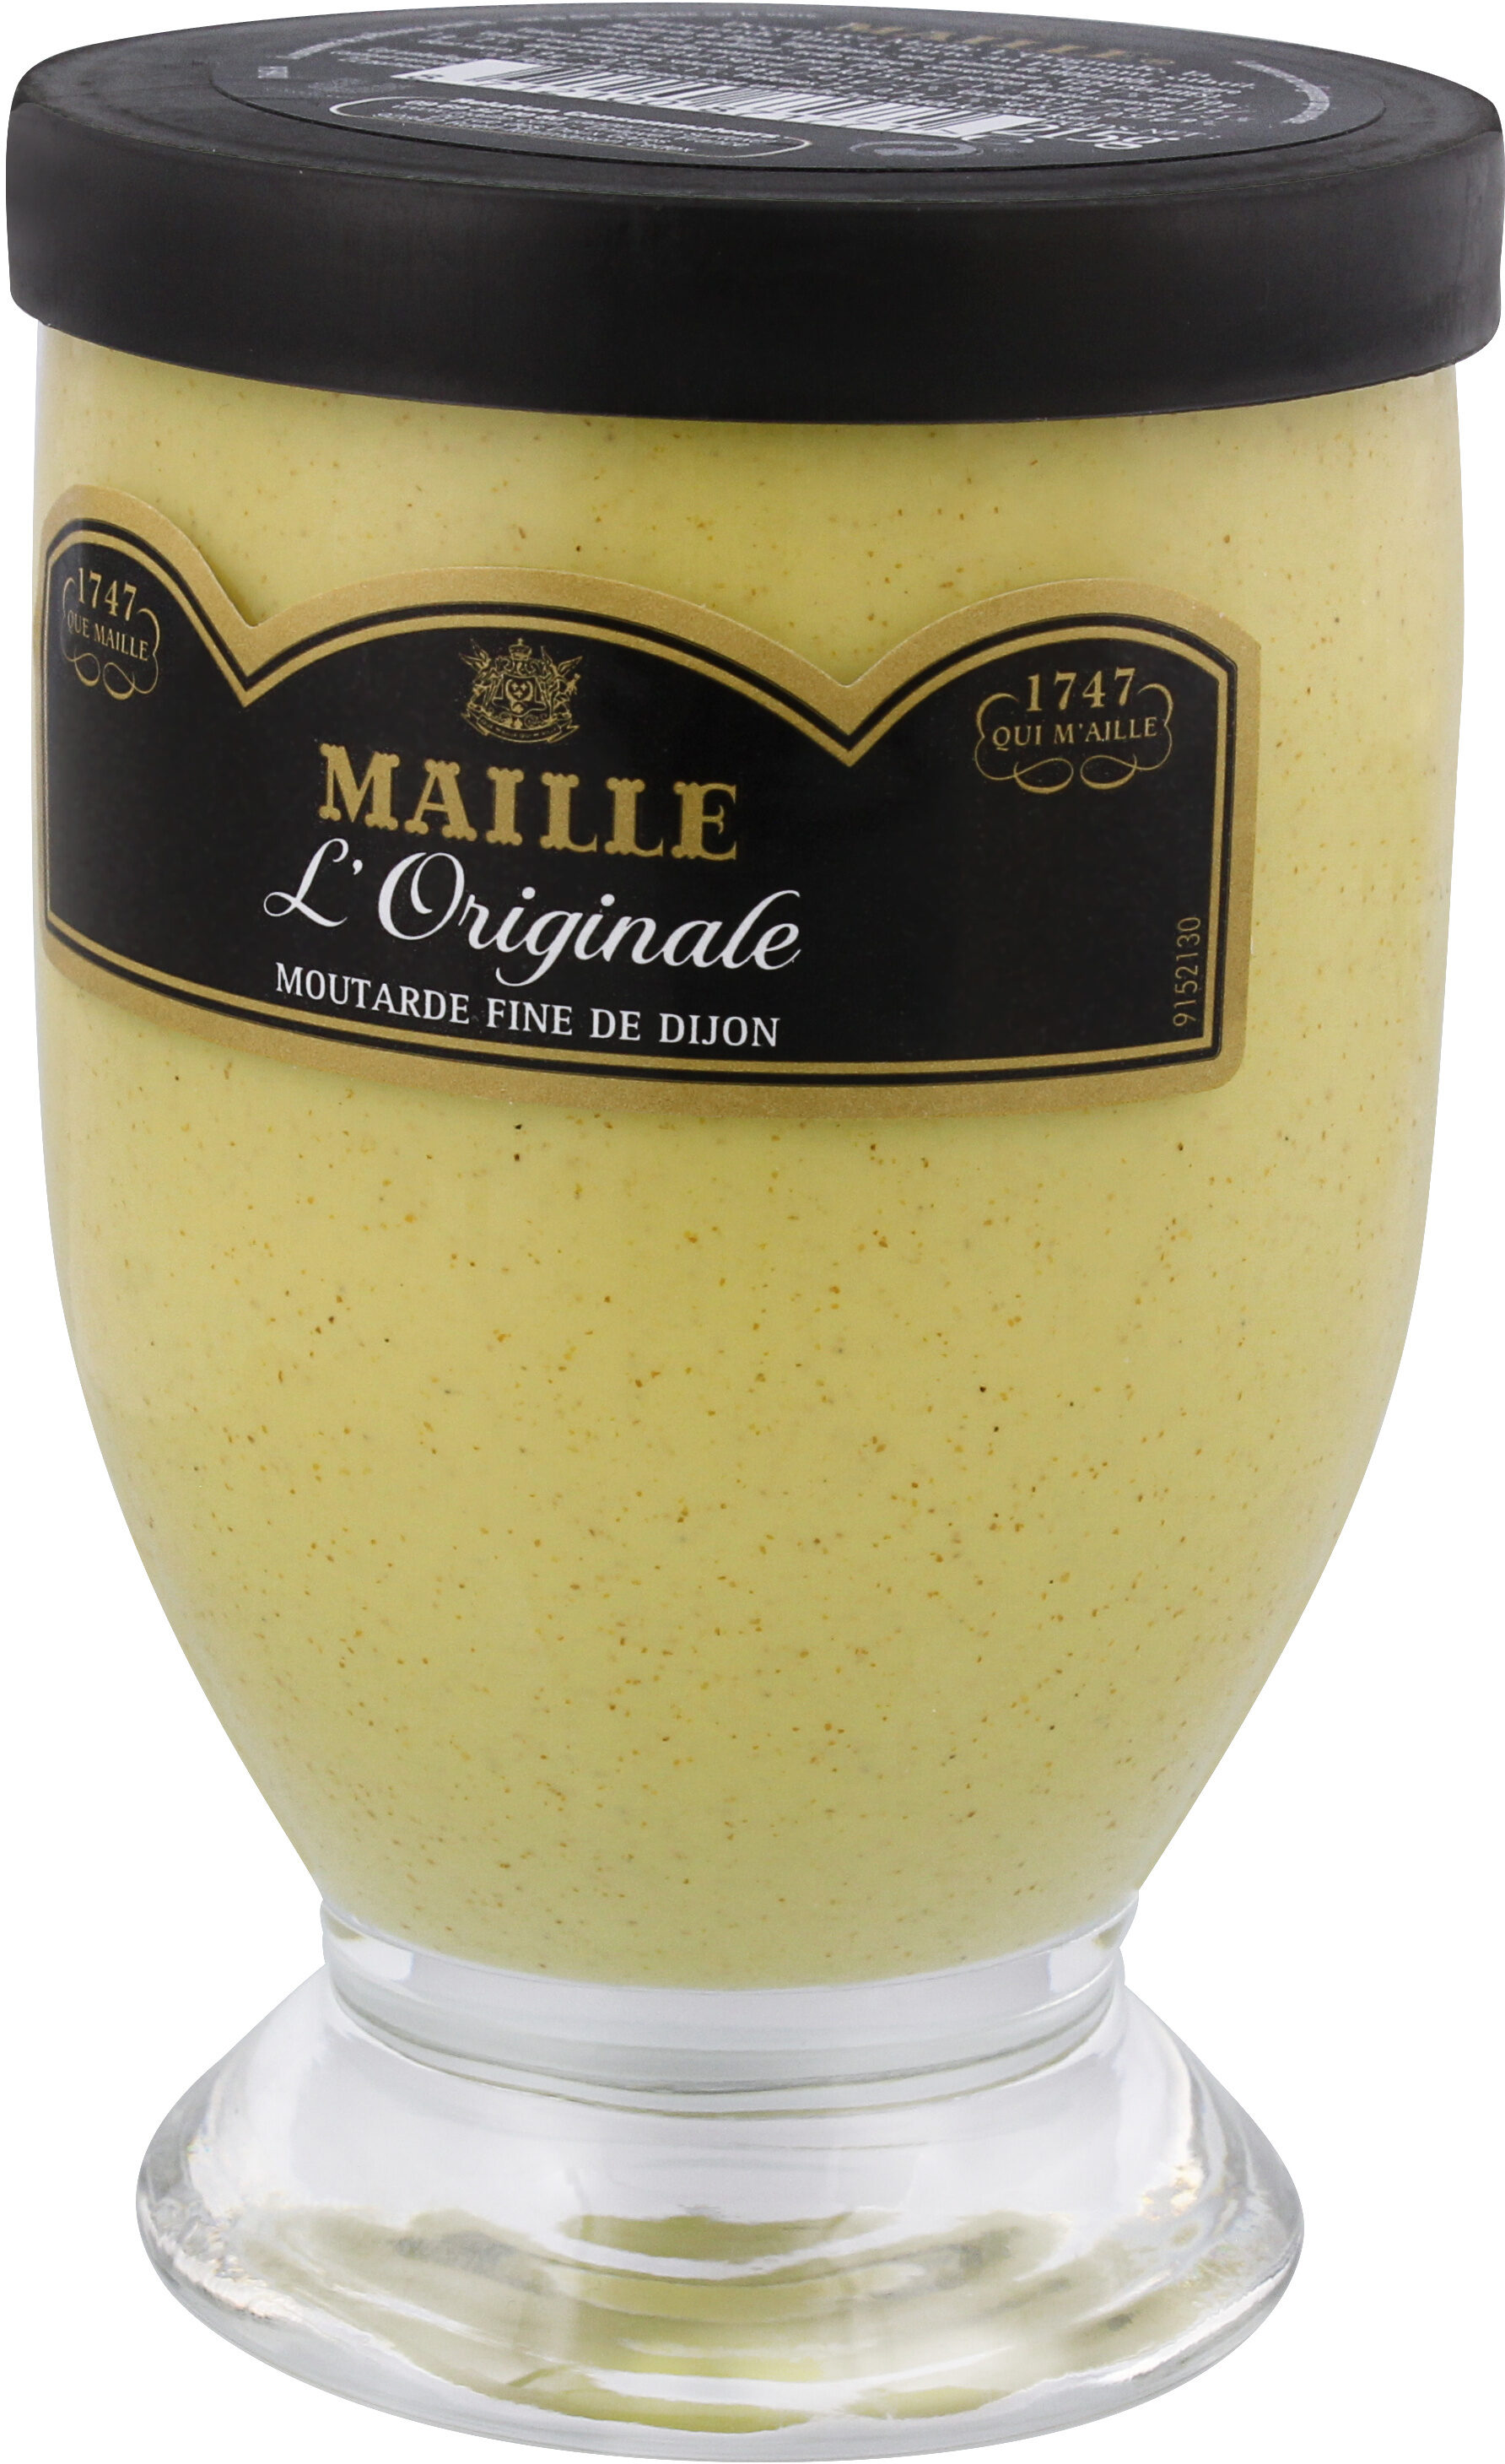 L'Originale Moutarde Fine De Dijon - Produit - fr